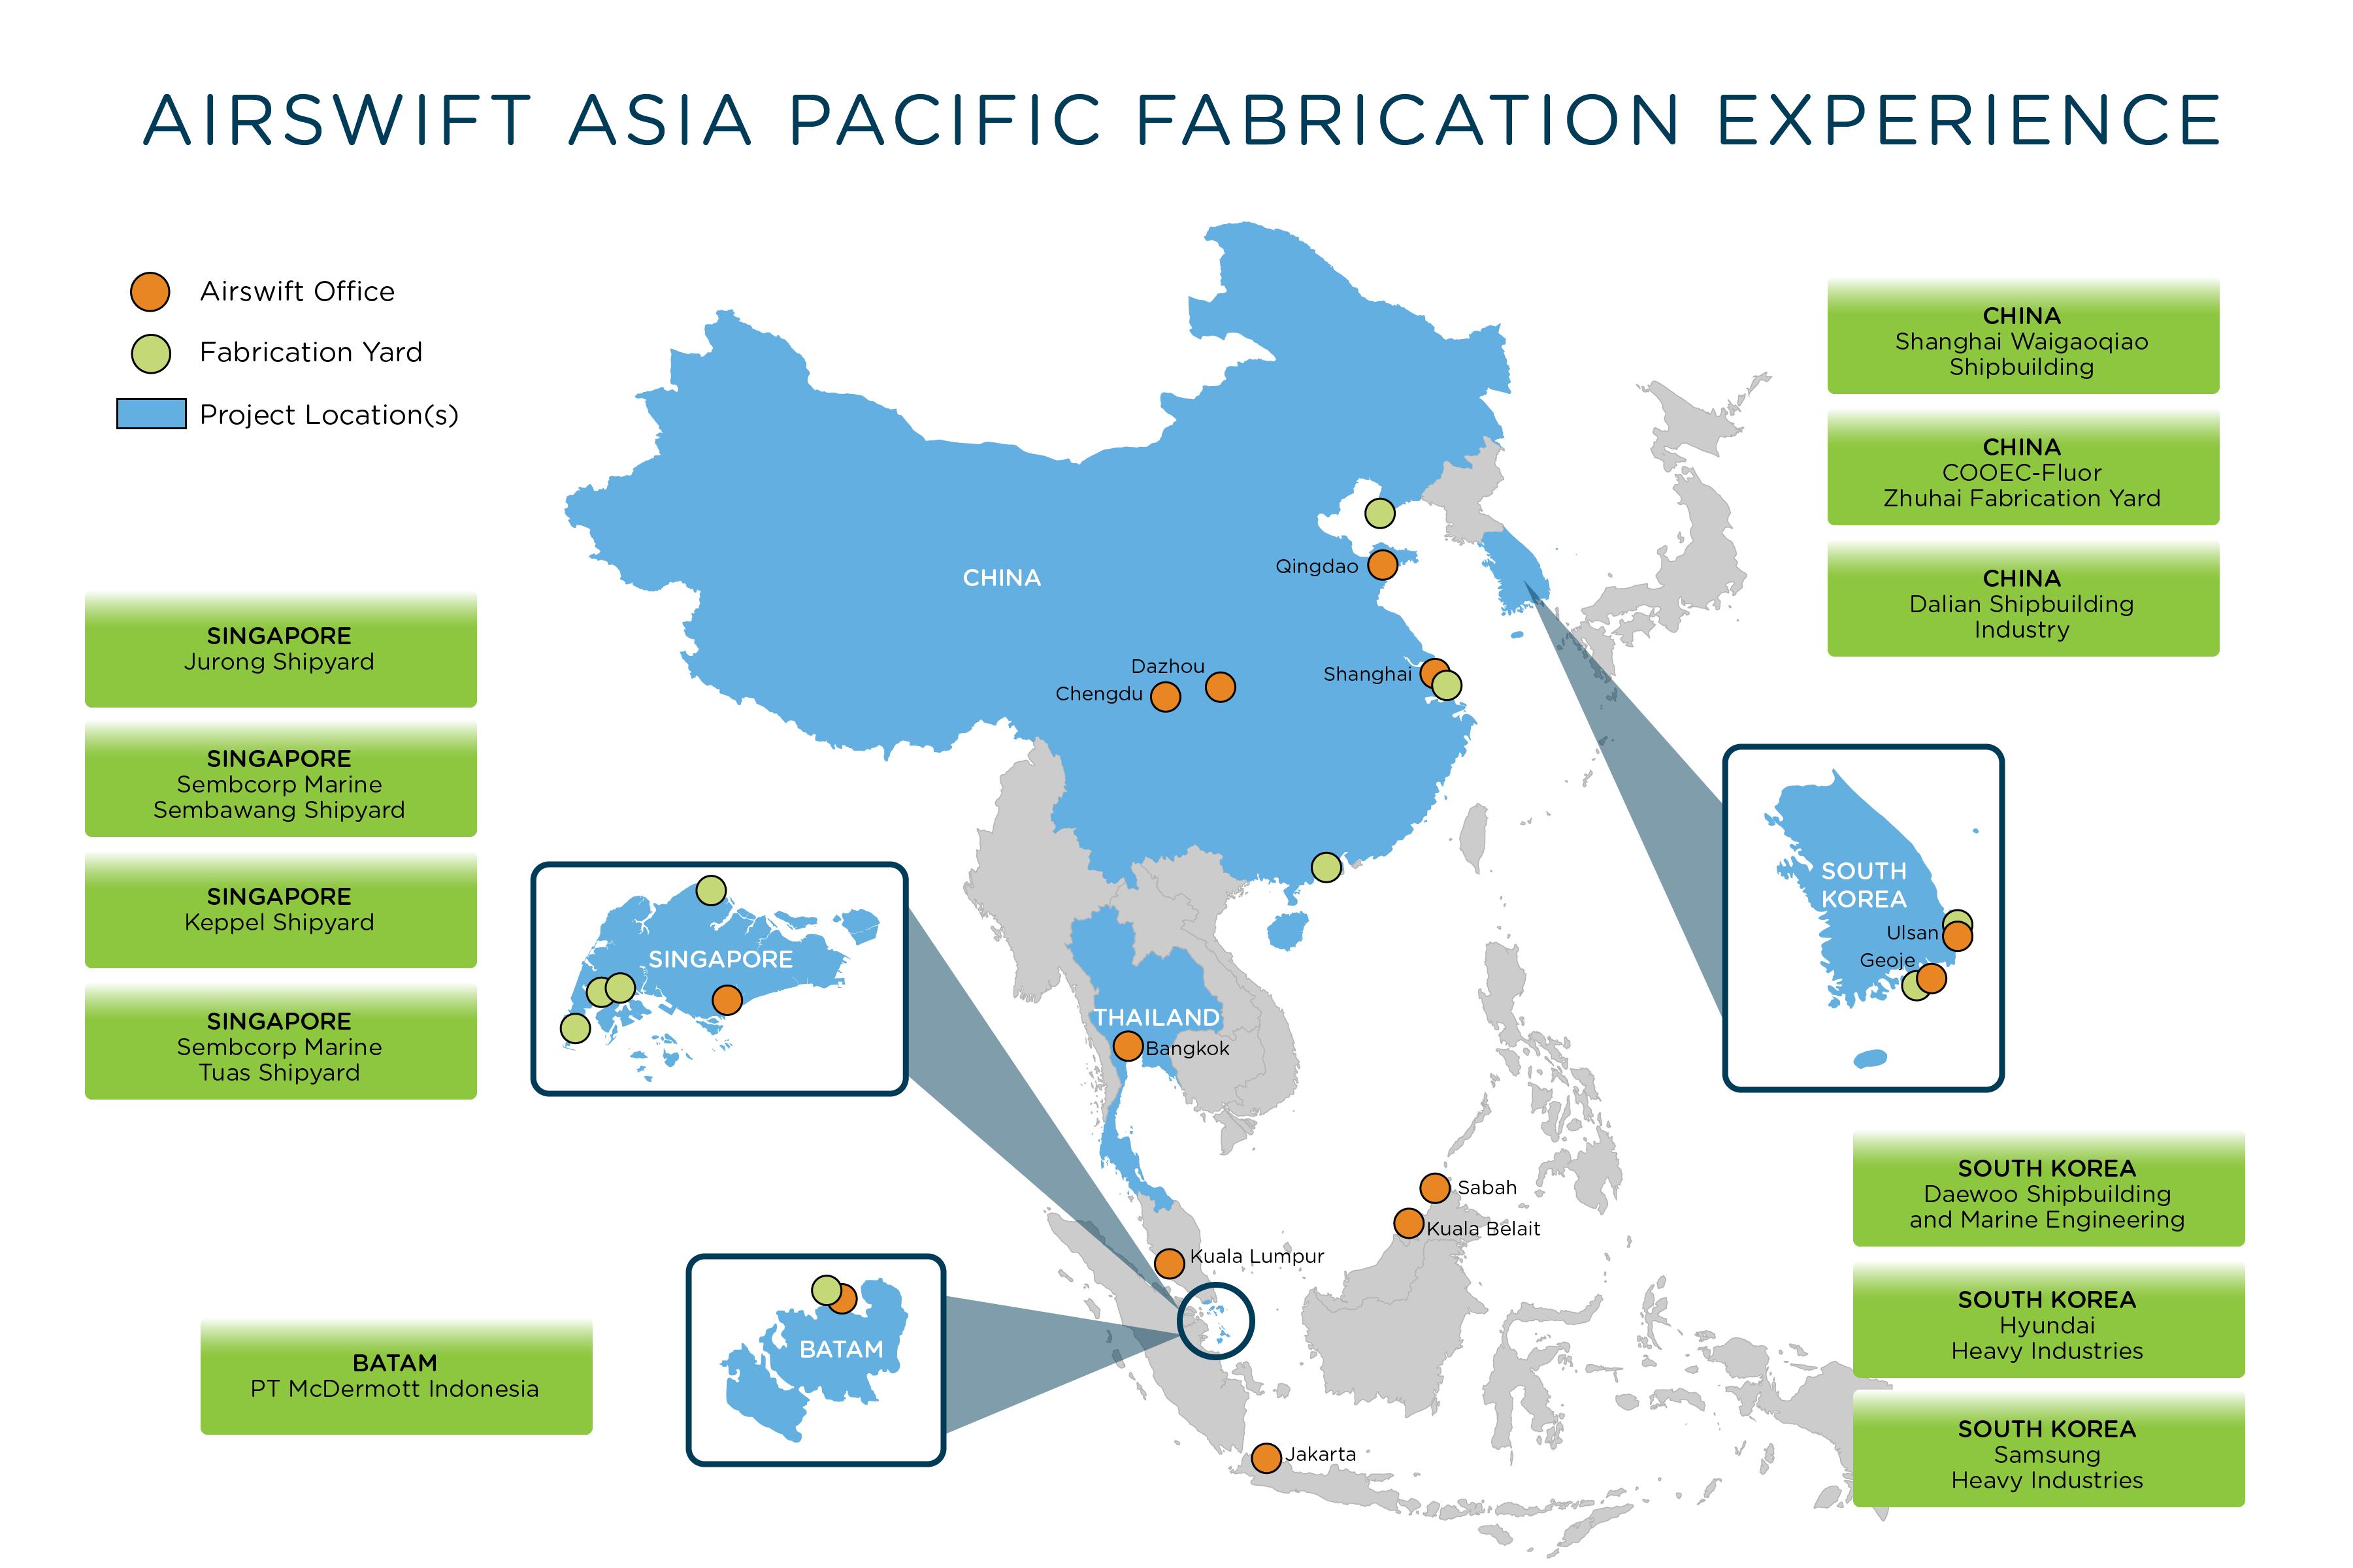 airswift-asia-fabrication-yard-experience